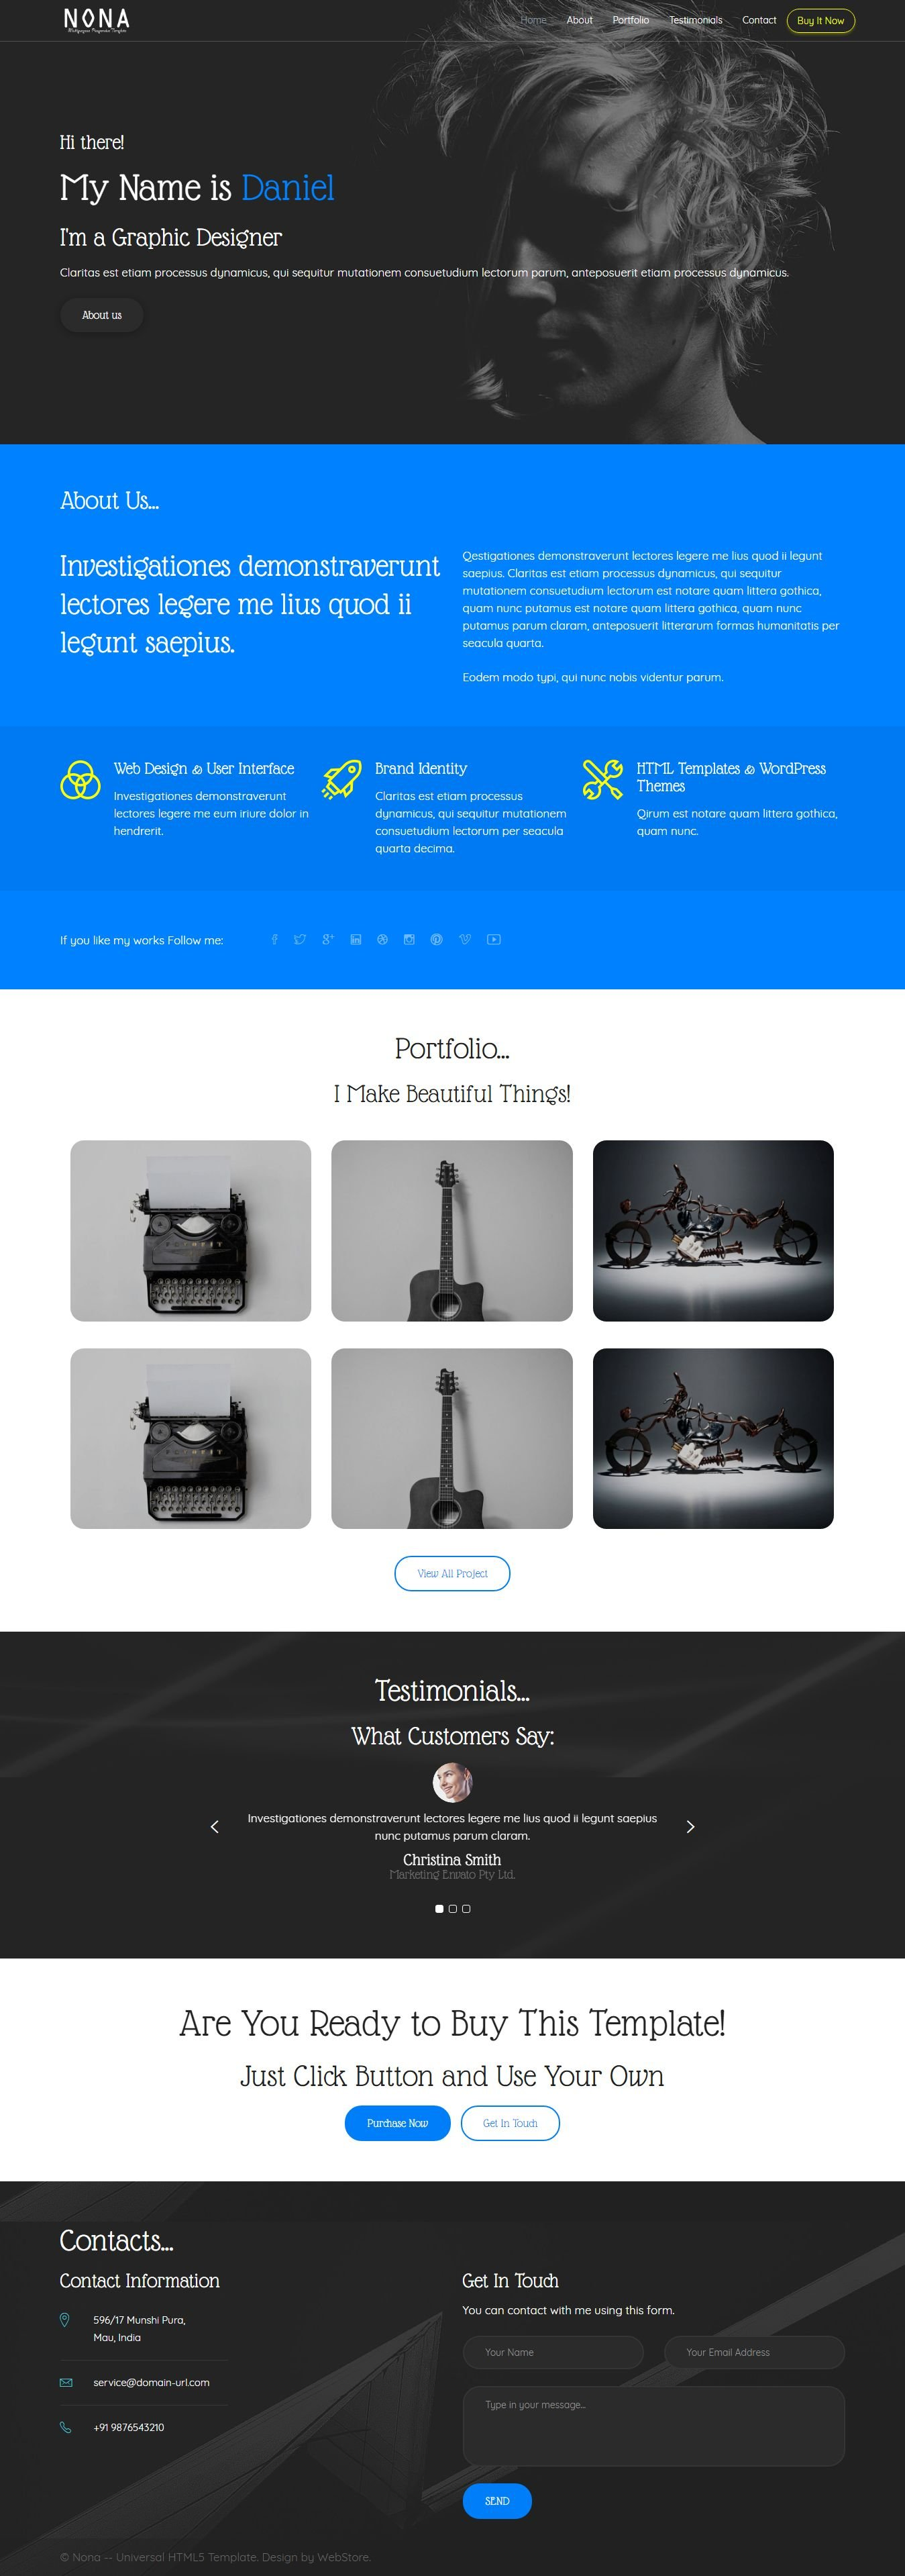 Nona - Multipurpose HTML5 Template - HTML Portfolio Website ...